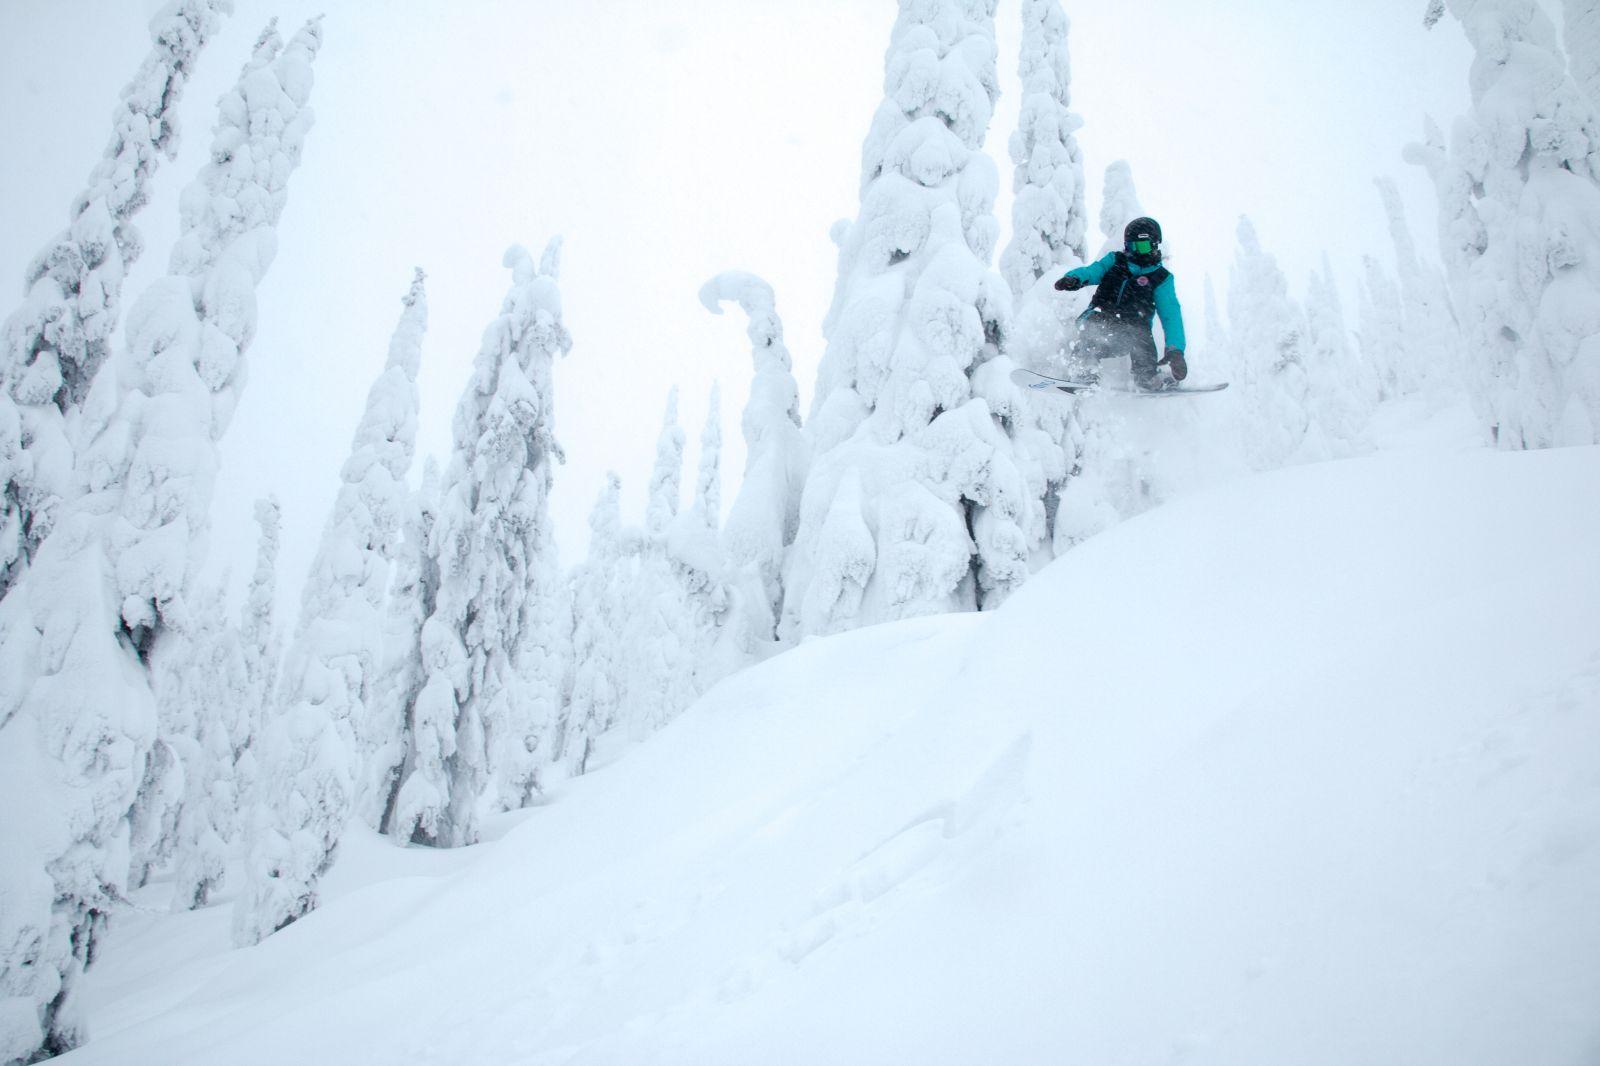 keeping it coming! | montana daily snow | snow forecast & ski report